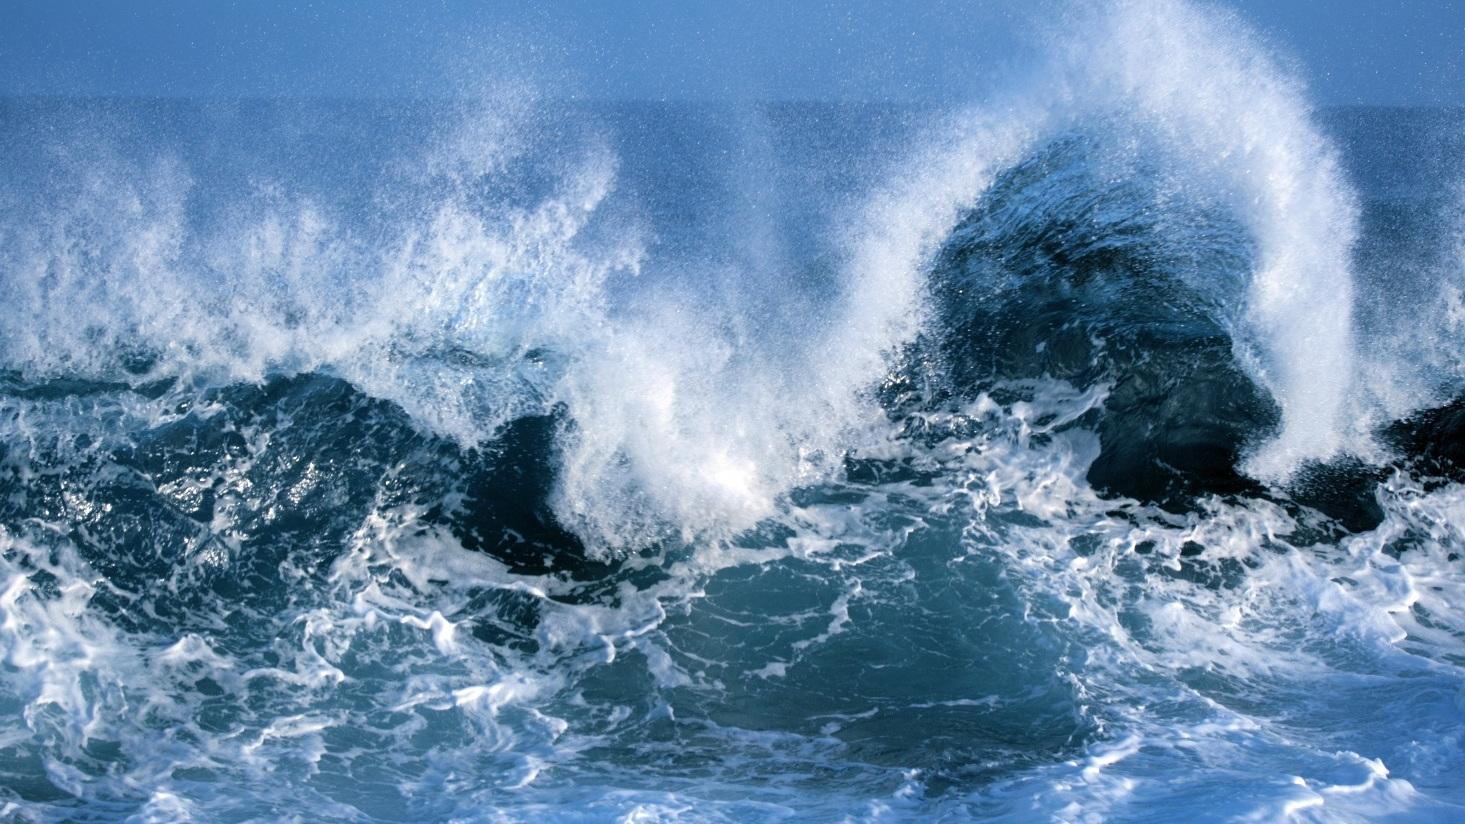 Ocean waves [CREDIT: Global Climate Budget 2018]